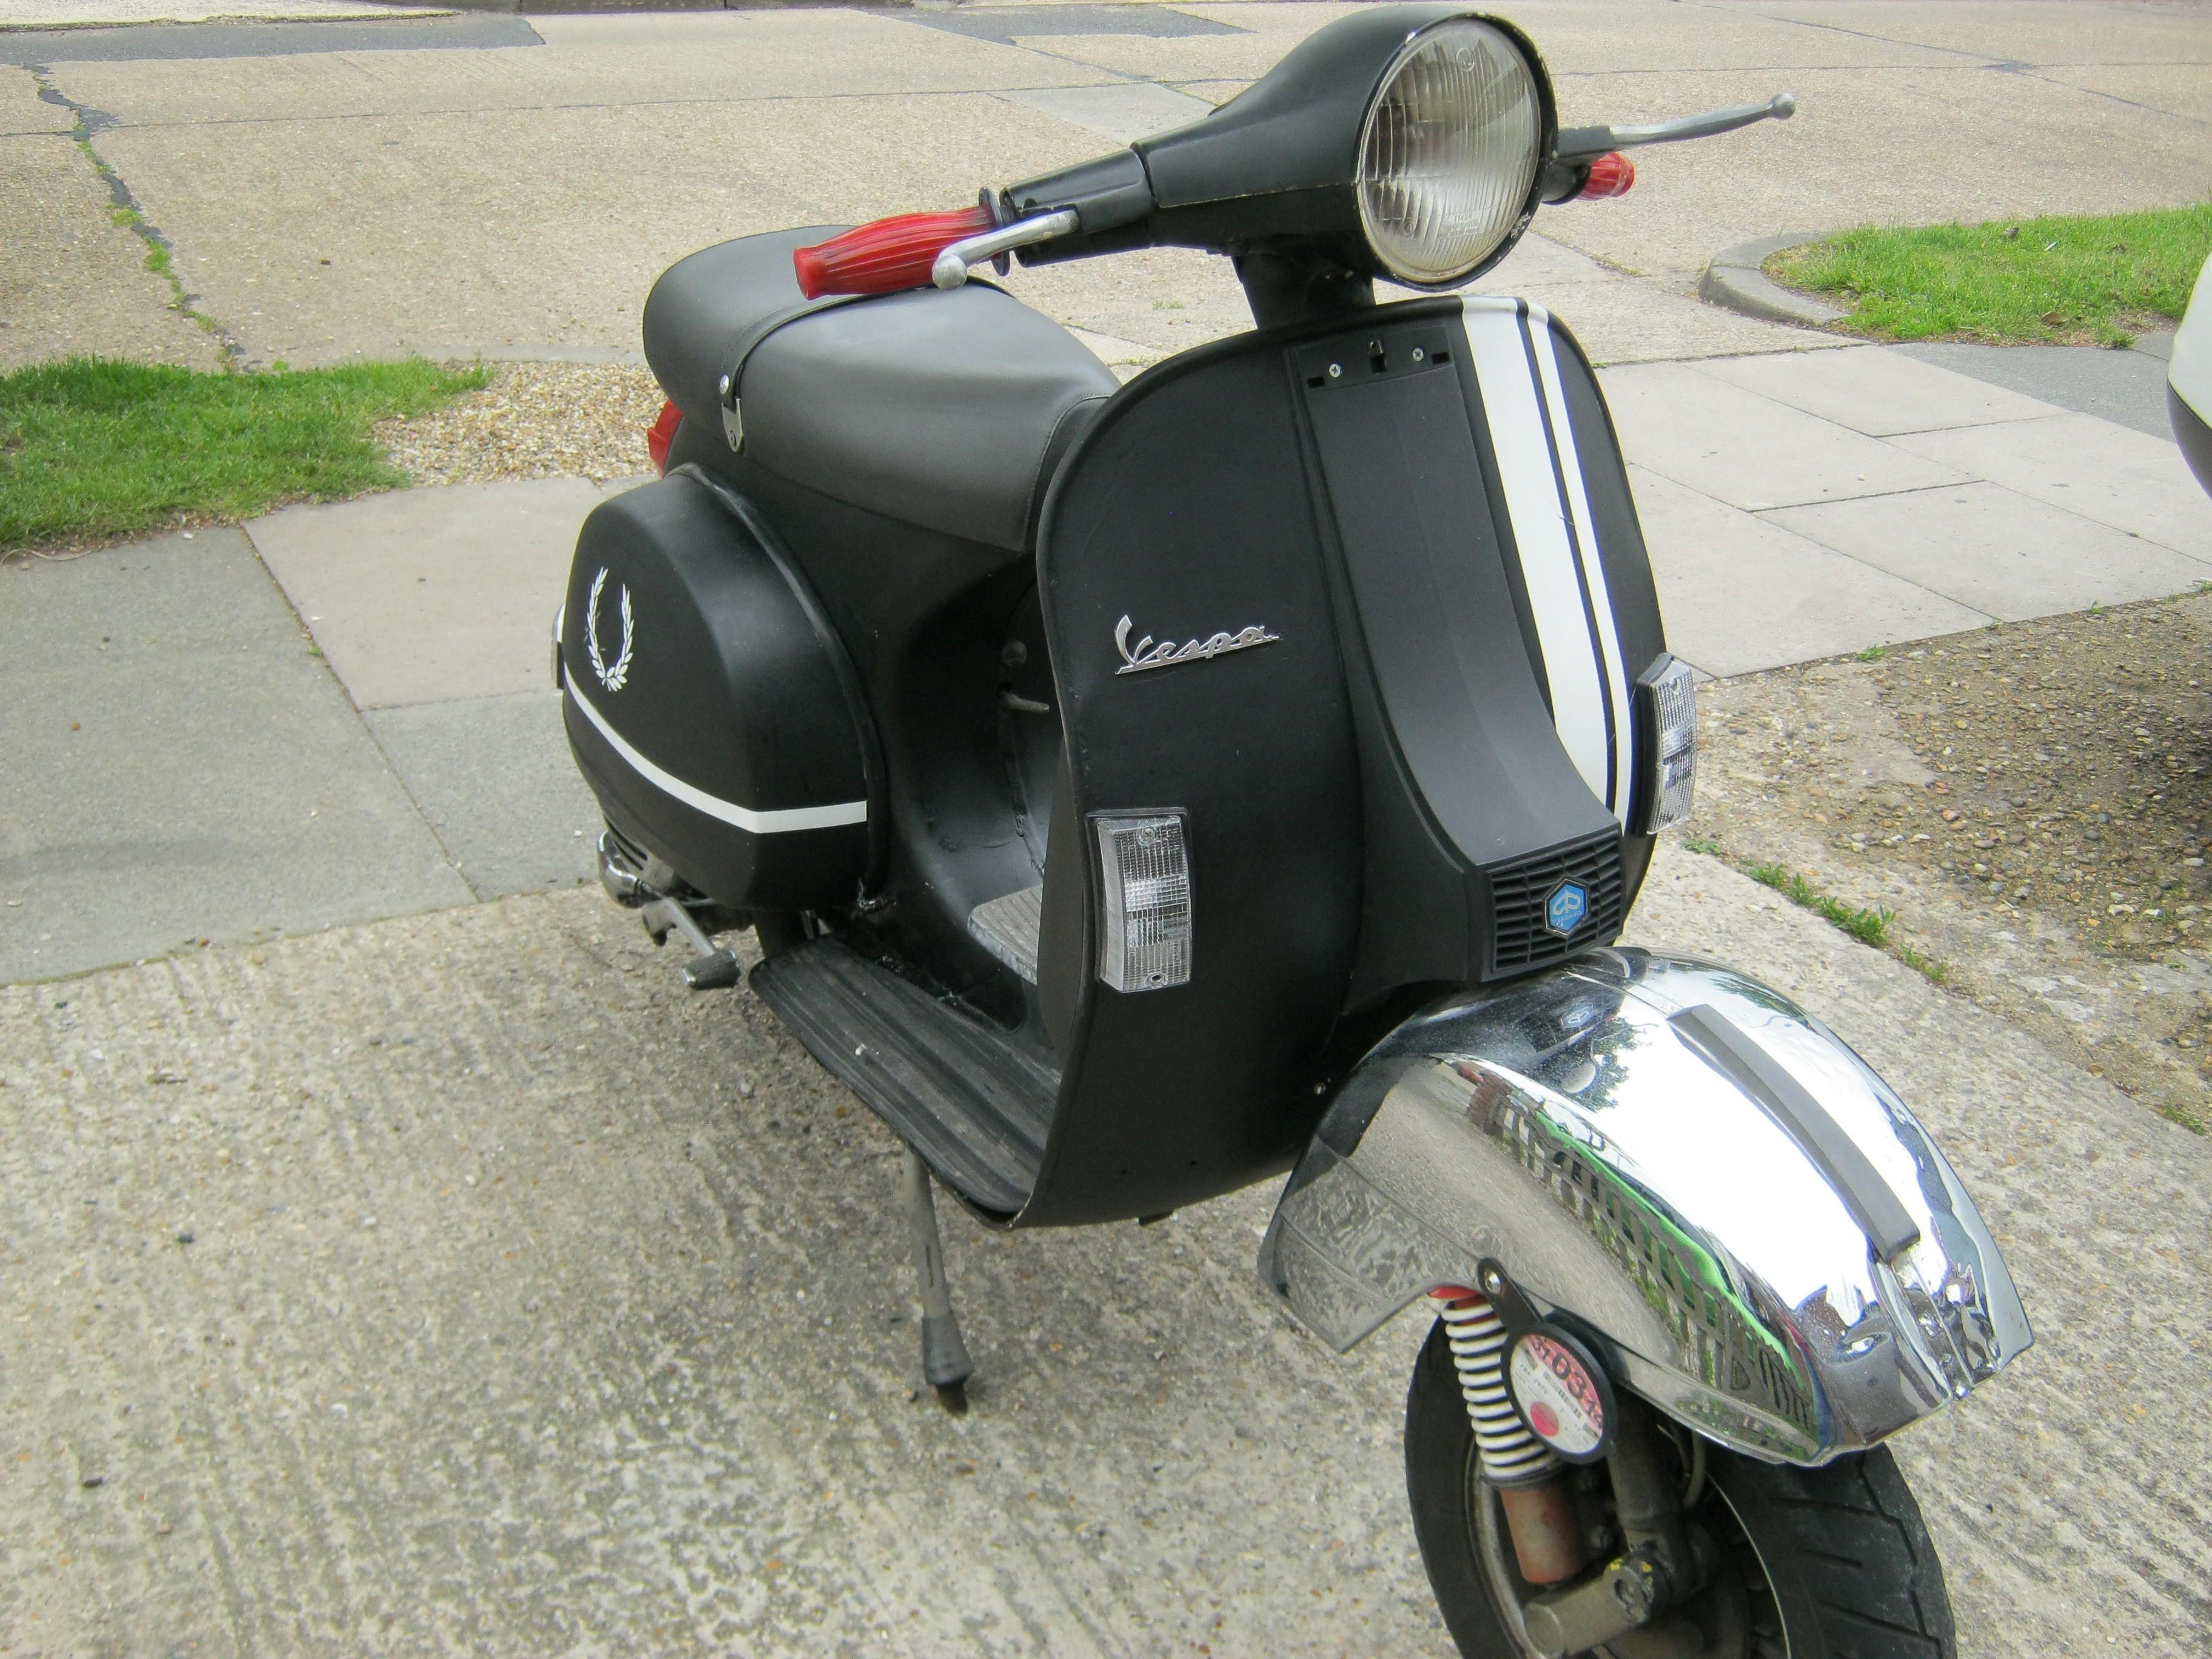 PX125, 1979, Matt Black. £750 | Vespa mon amour ...